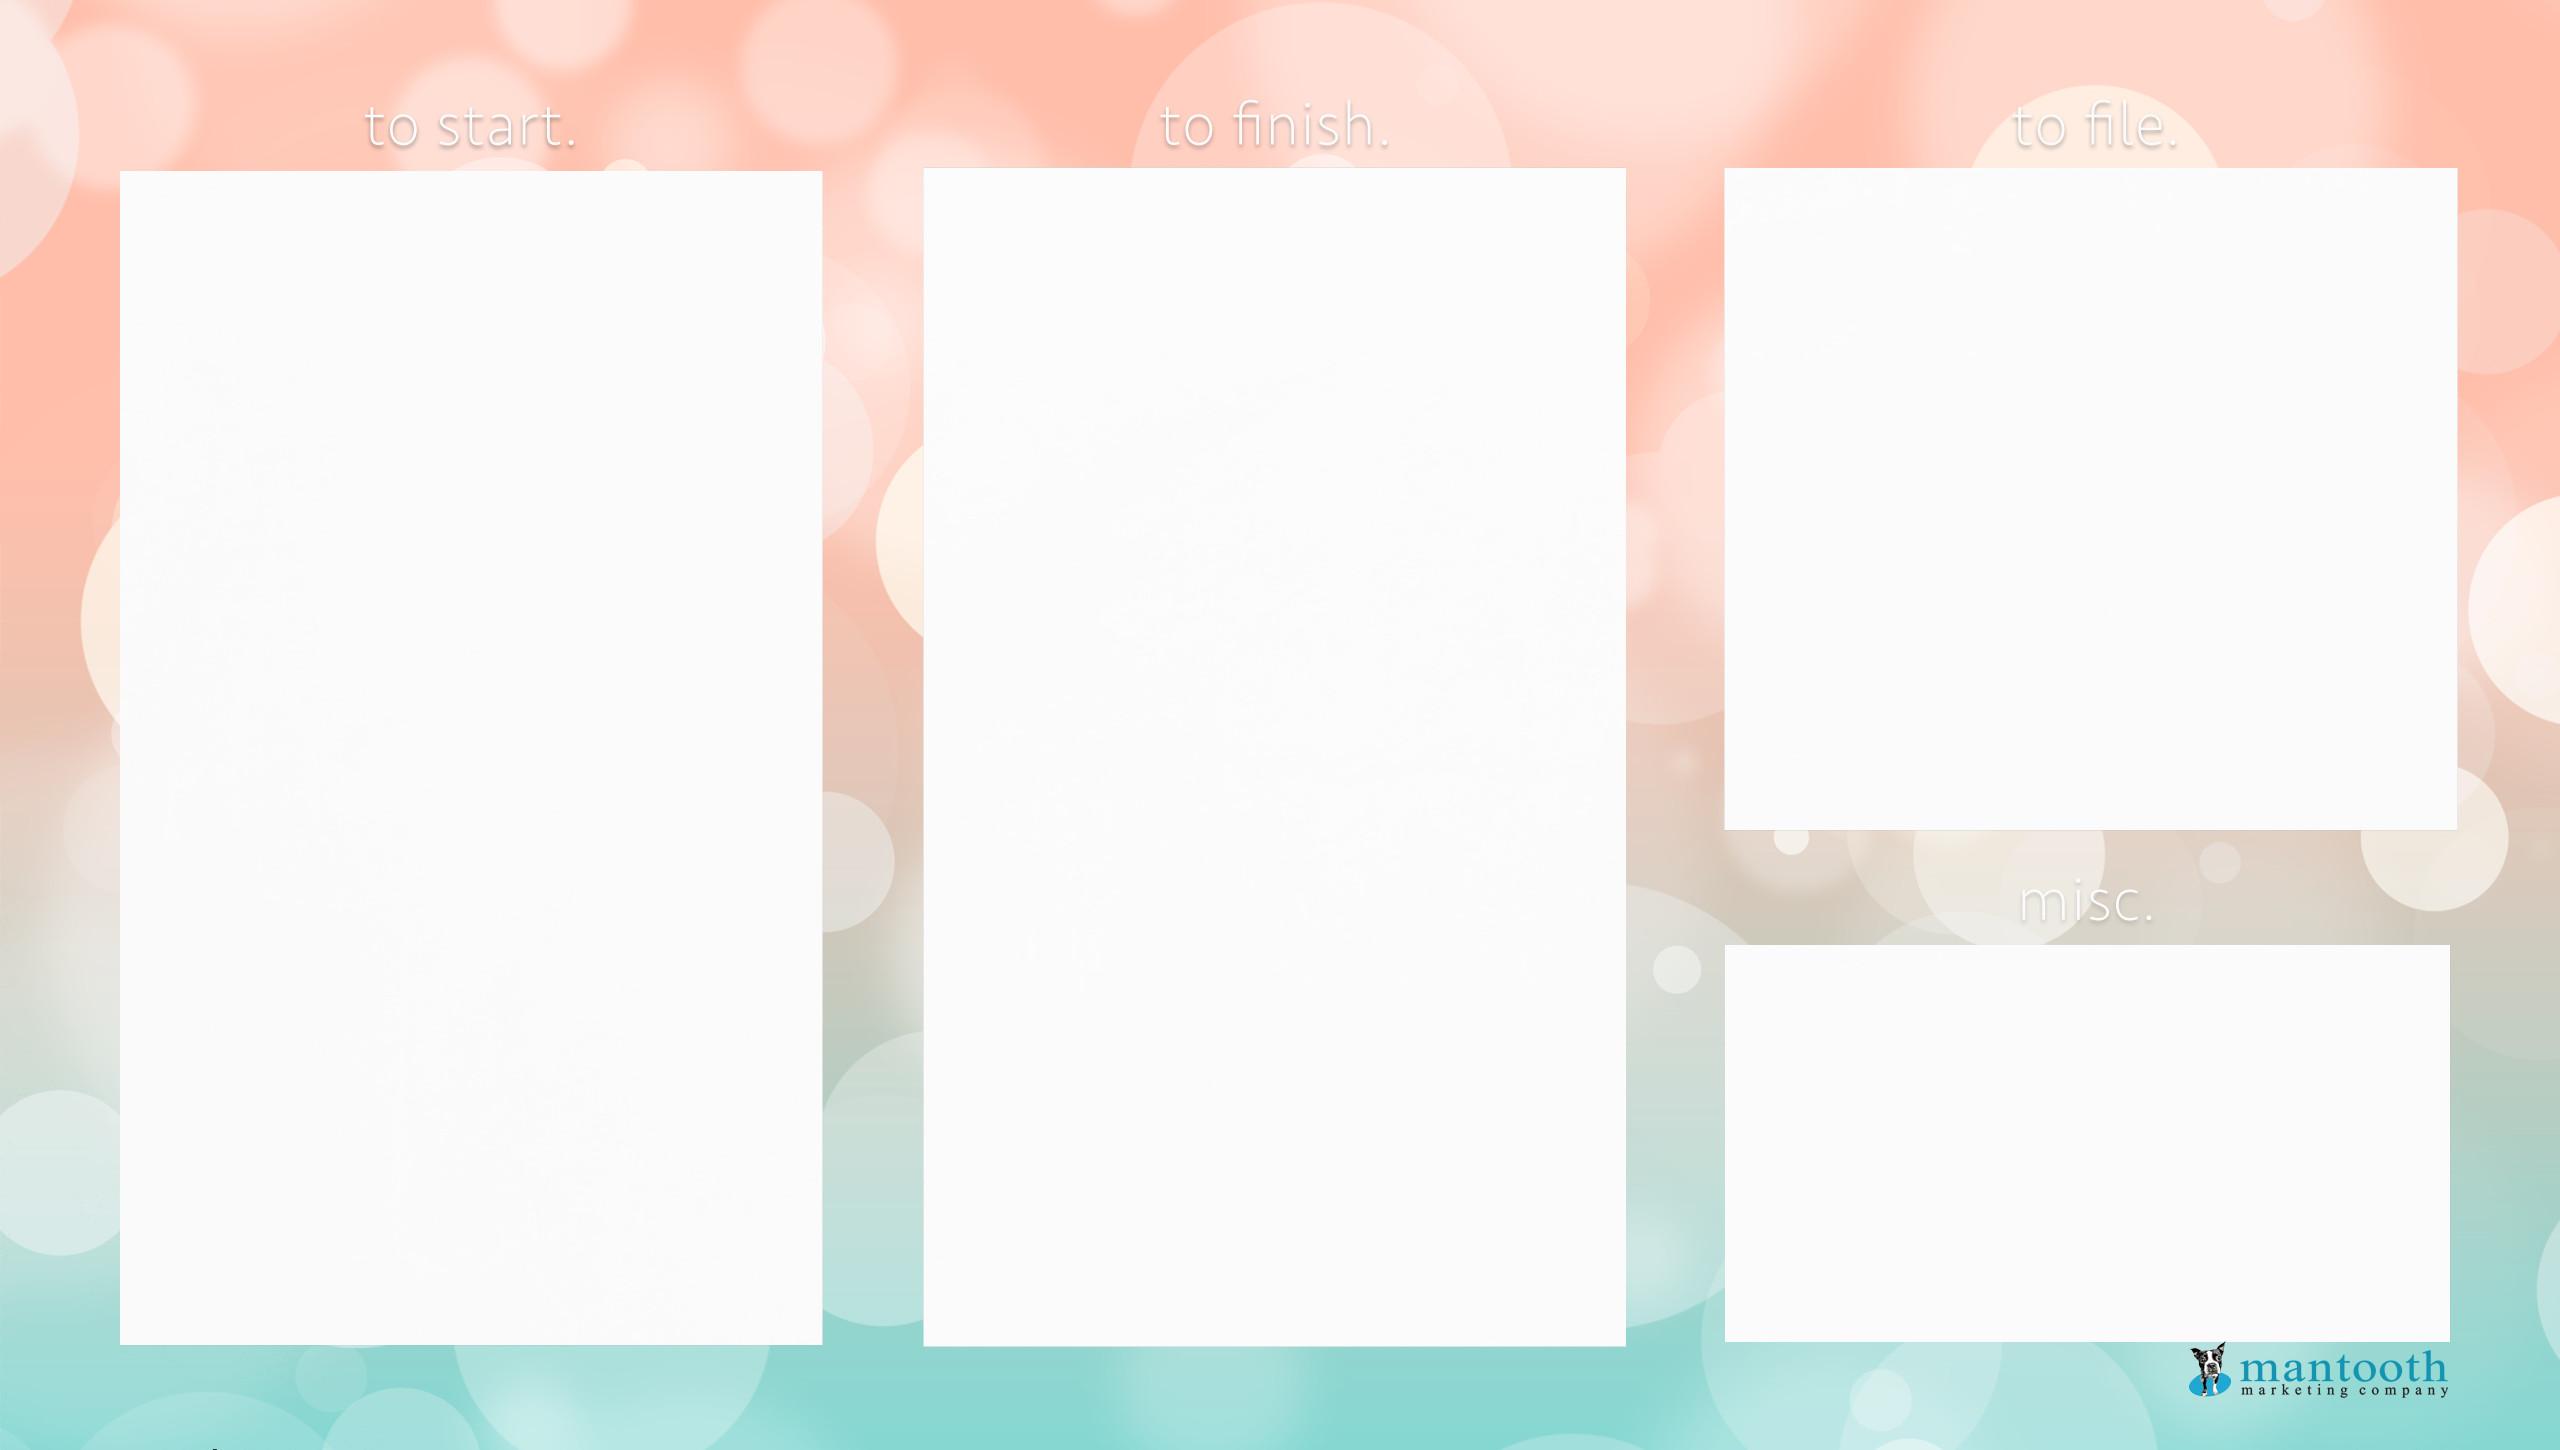 desktop organizer wallpaper background | Desktop Organizer – Wallpaper .